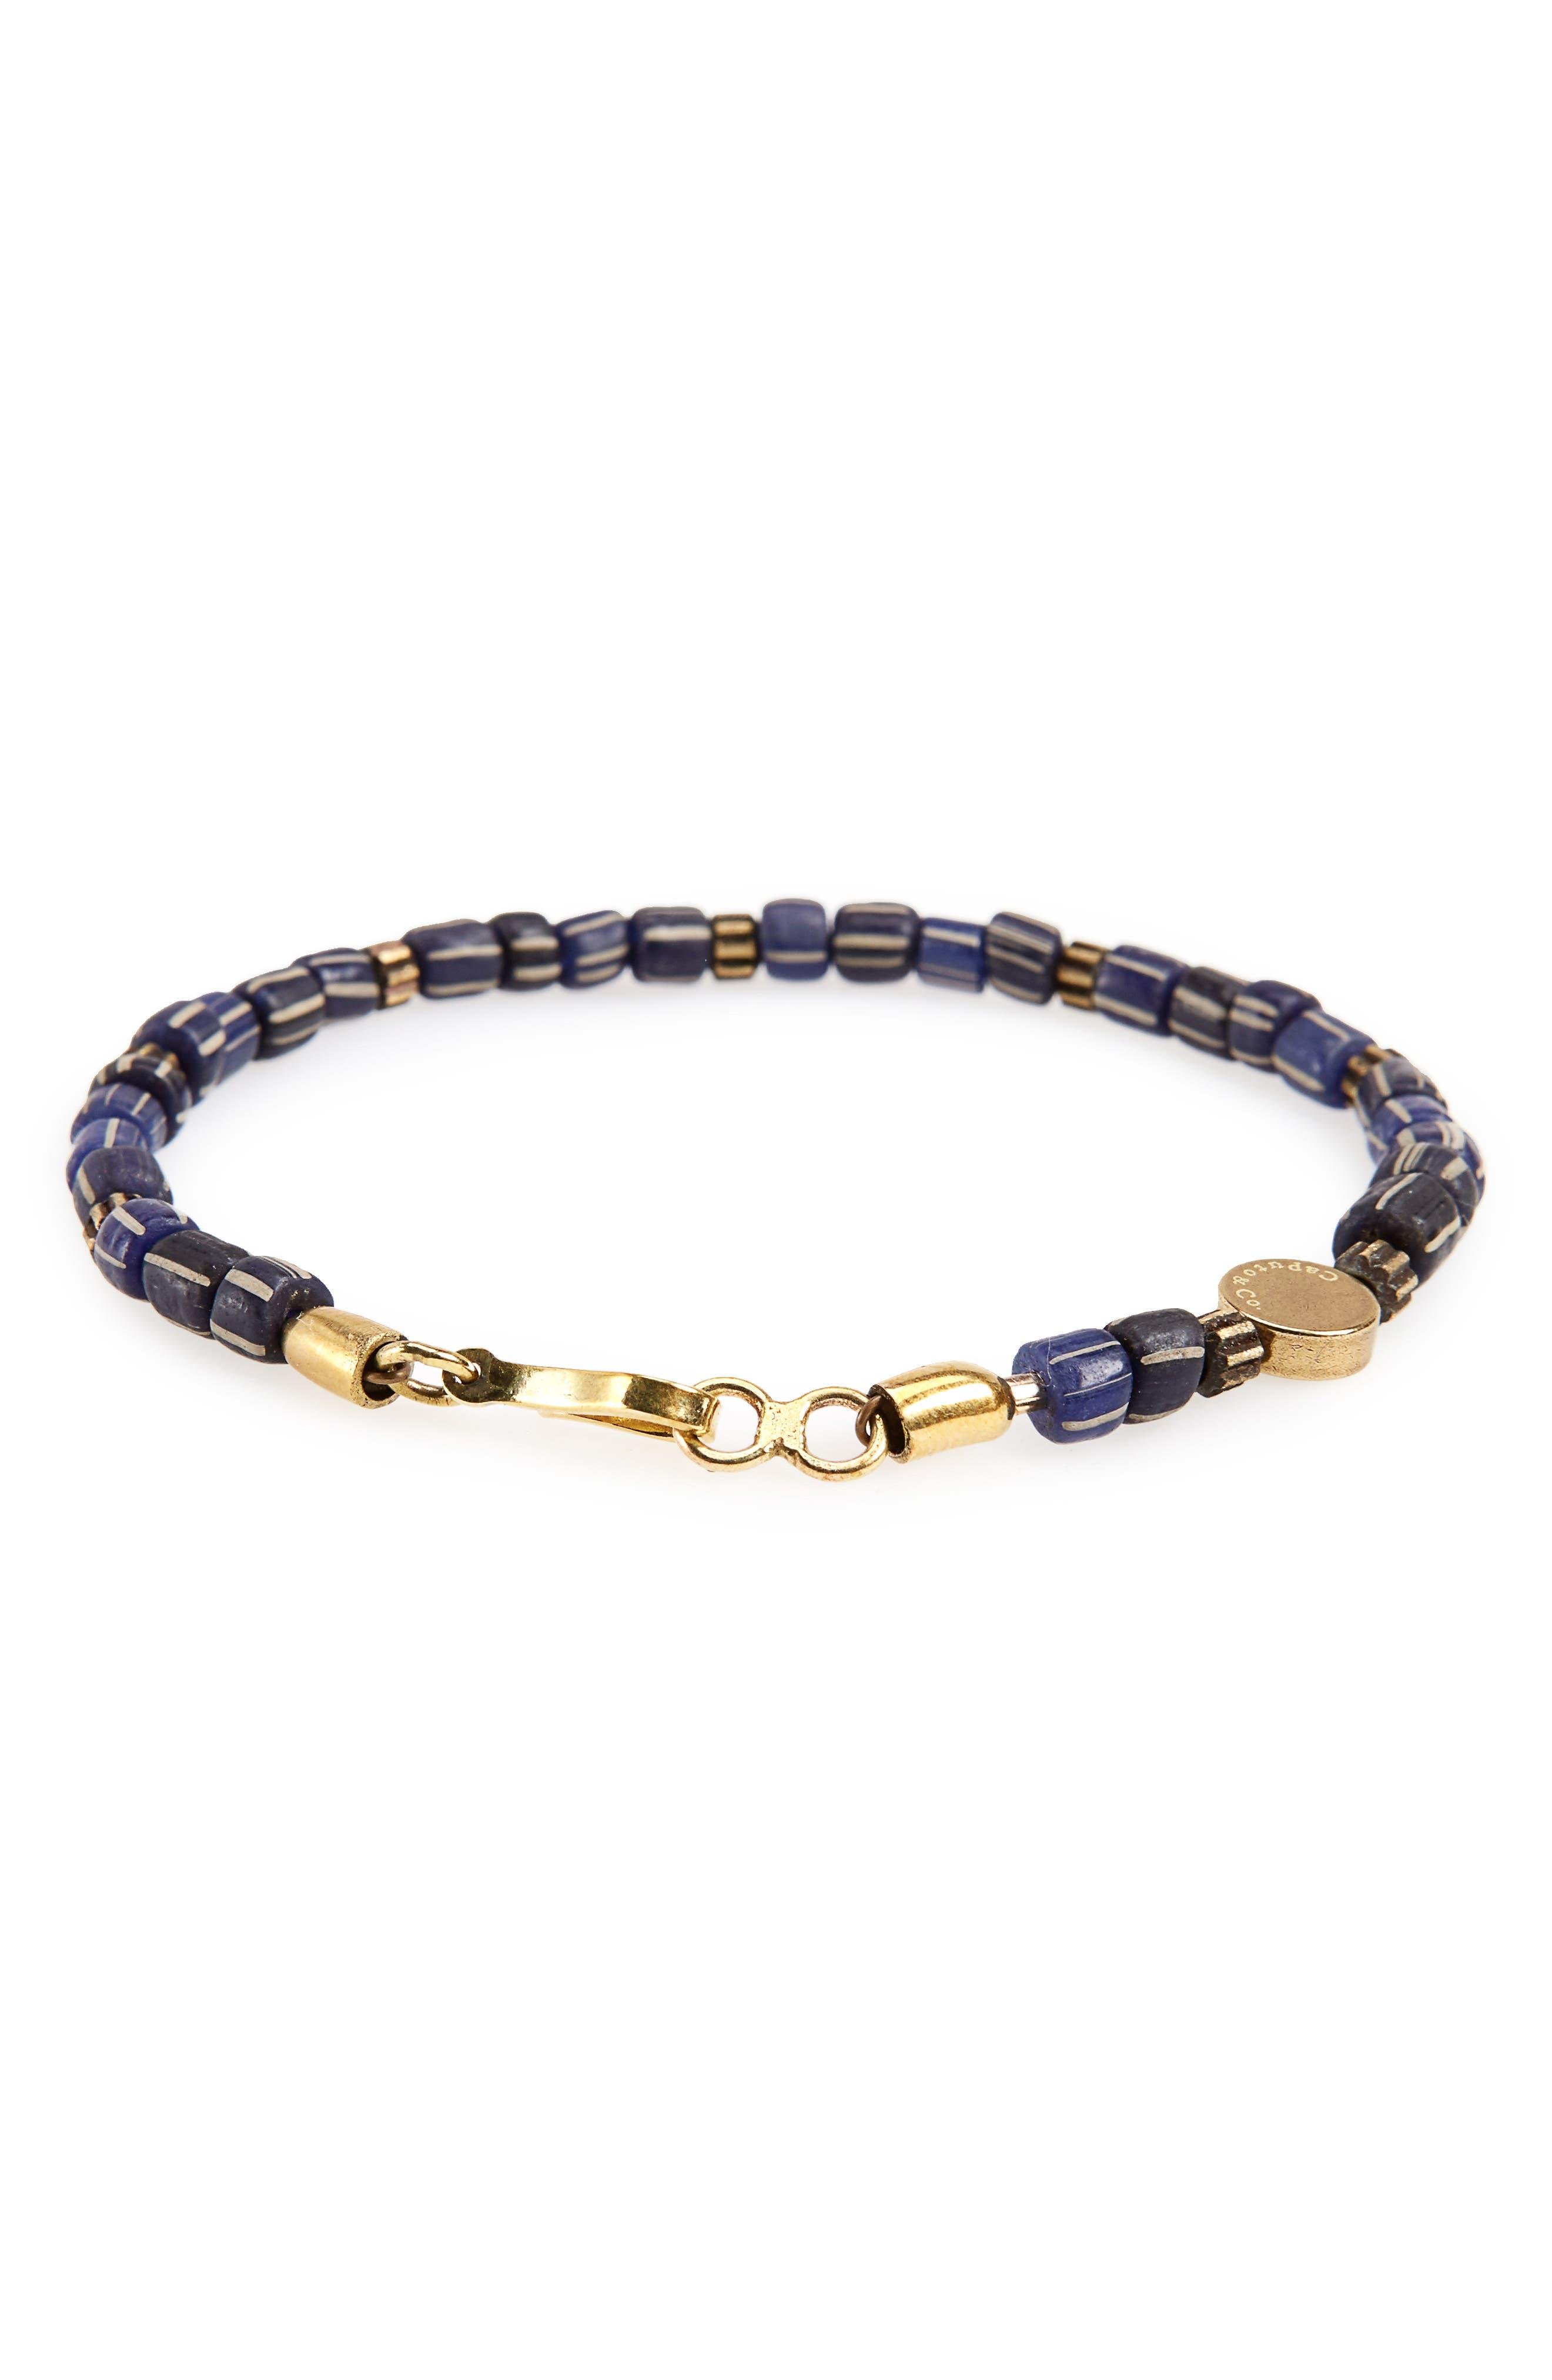 Caputo & Co. Glass Bead Bracelet